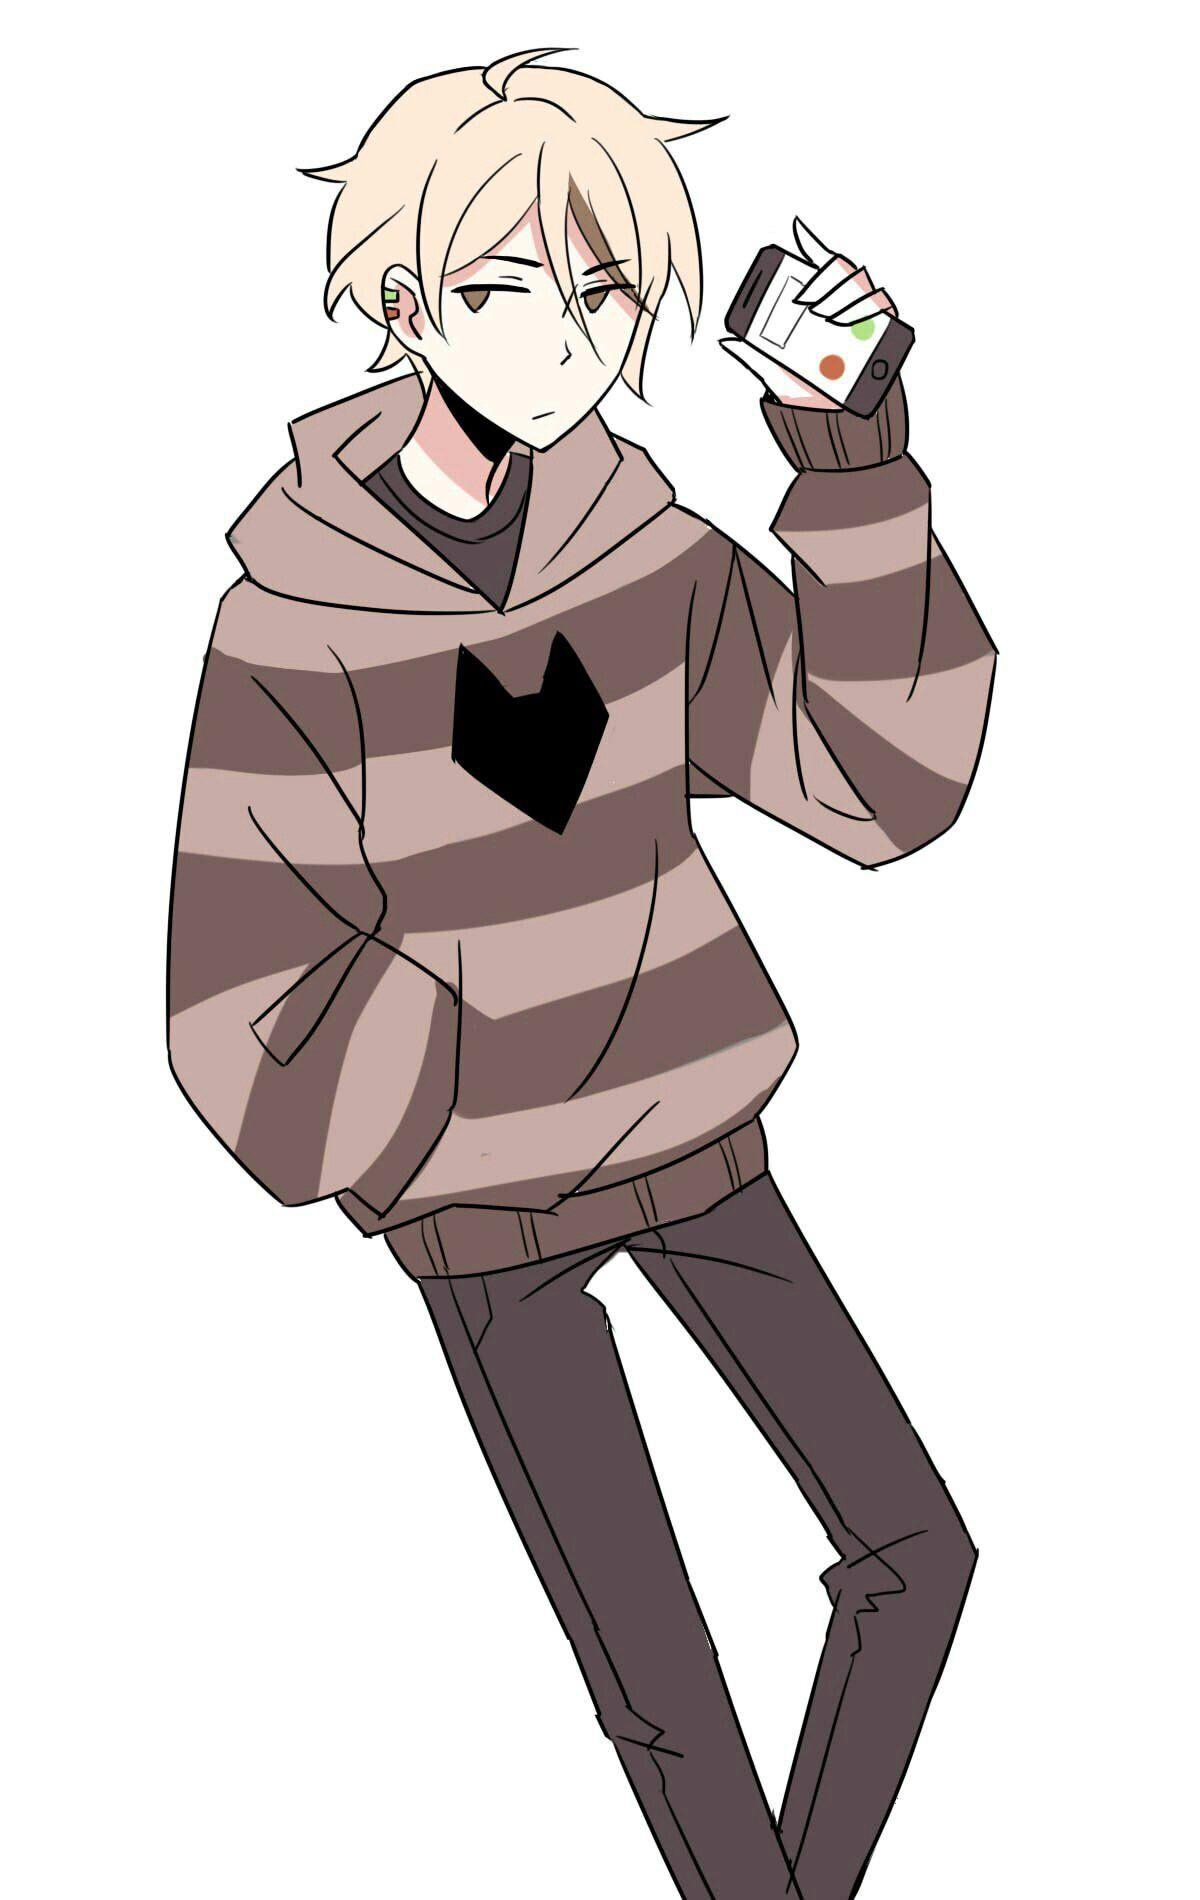 Pin By Jasmine Flower On Anime Cartoon Art Styles Cartoon Art Character Art